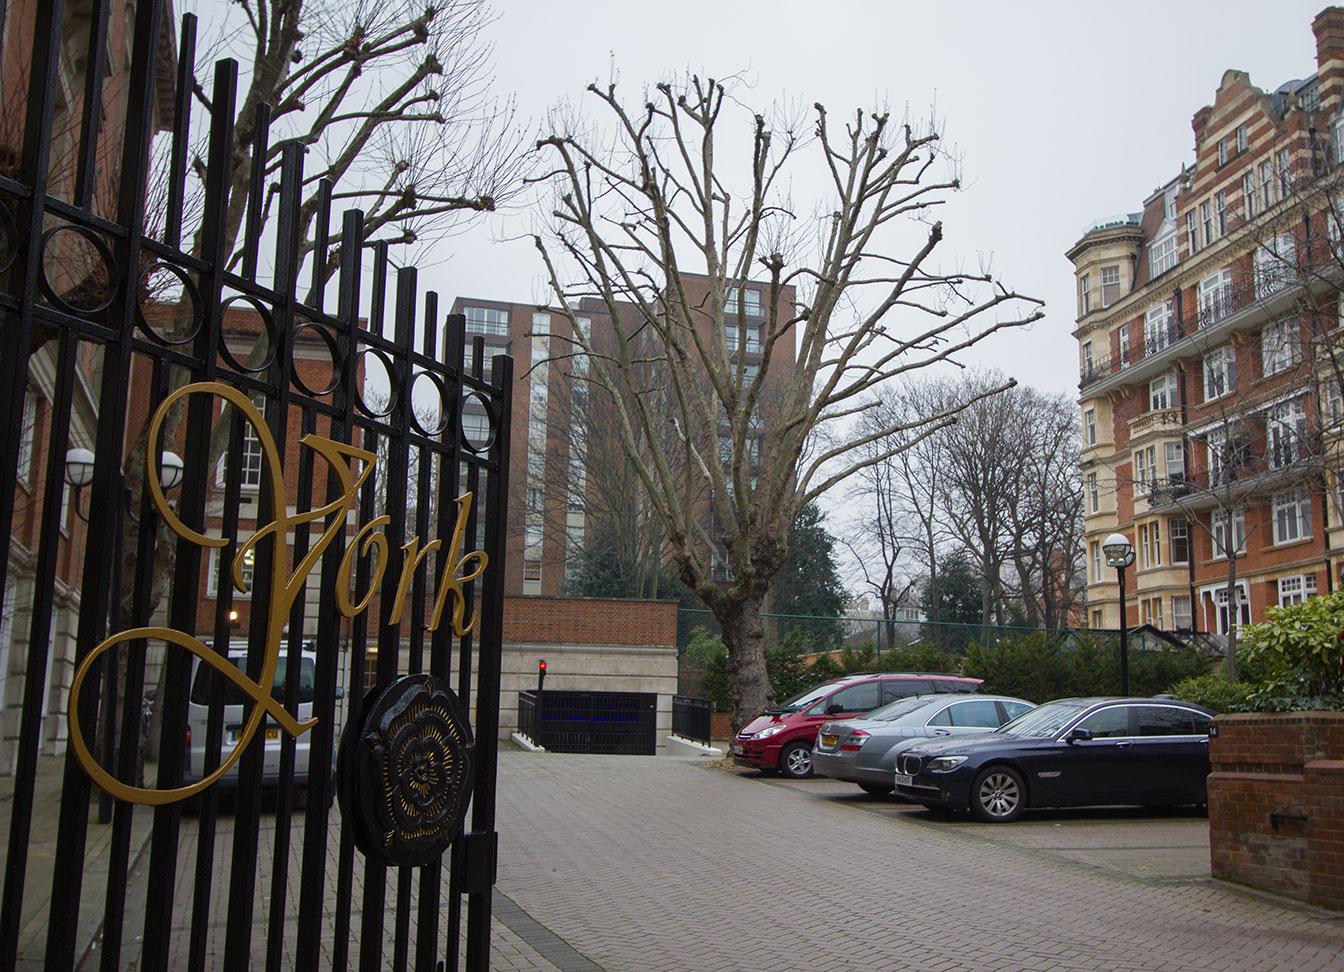 PML_Kensington-YorkHouse_01